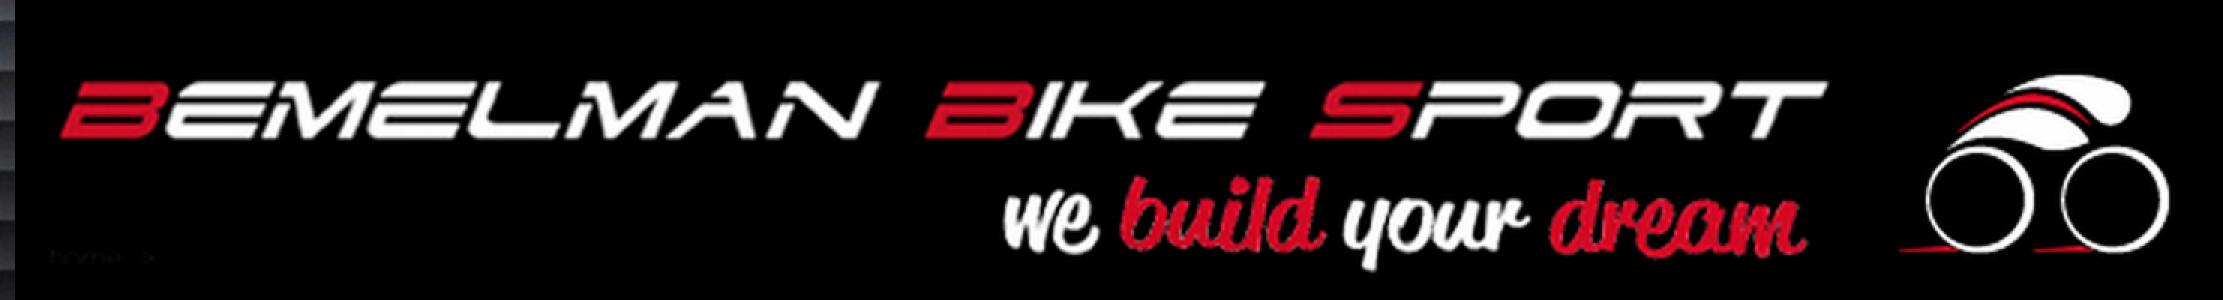 Bemelman Bikesport